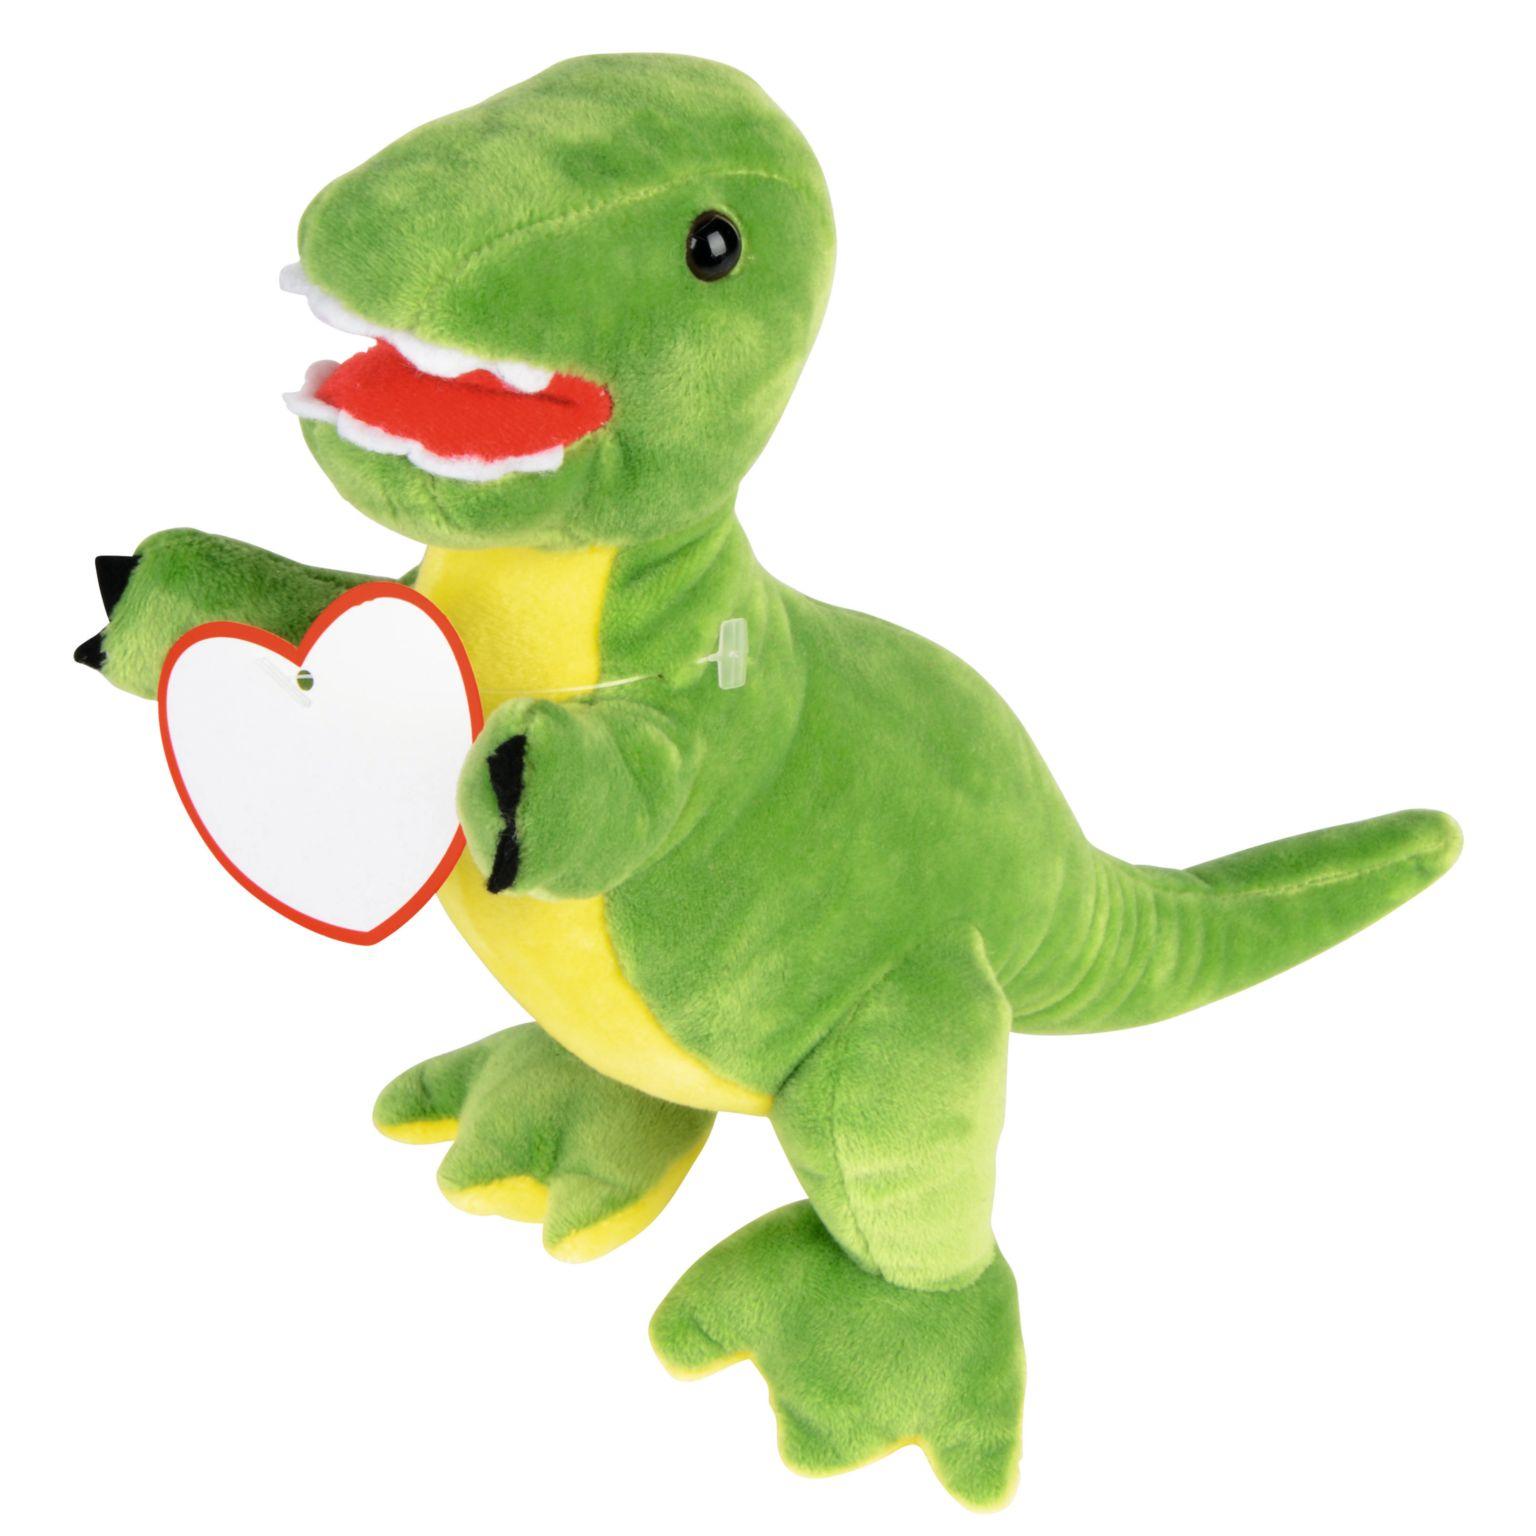 Plush dinosaur FRIGHTY REX